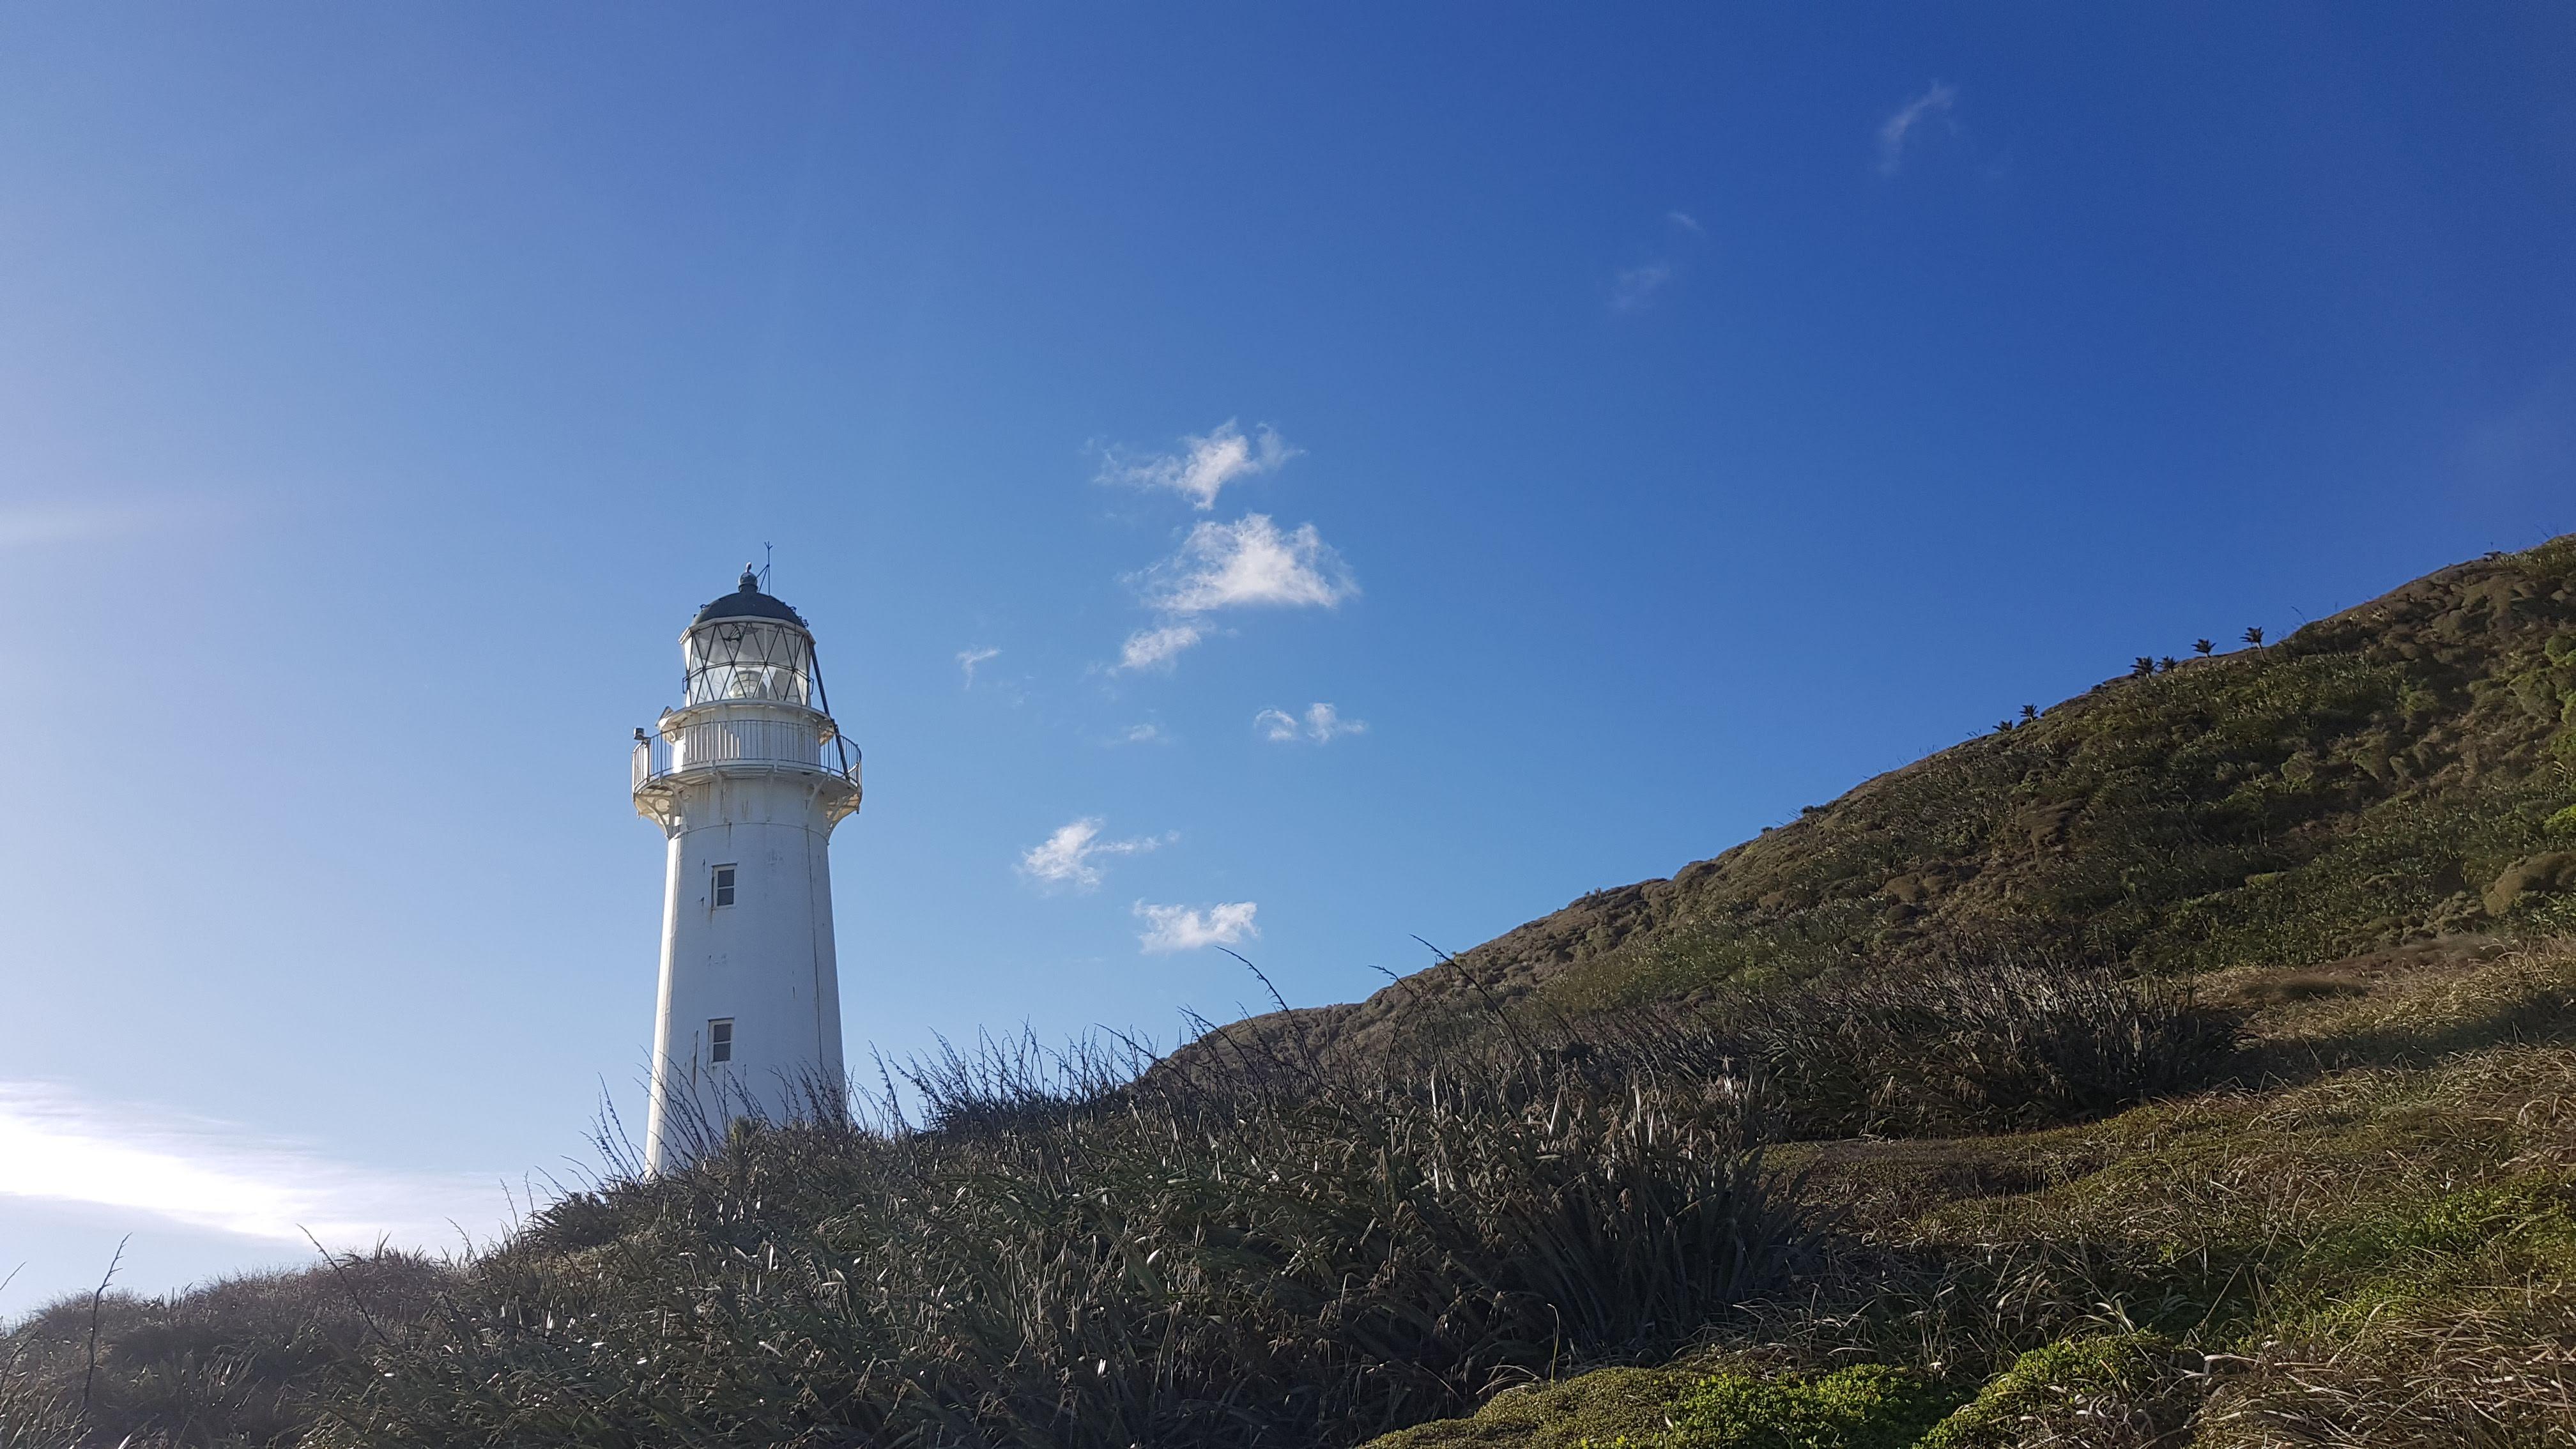 Looking up at the Kahurangi lighthouse